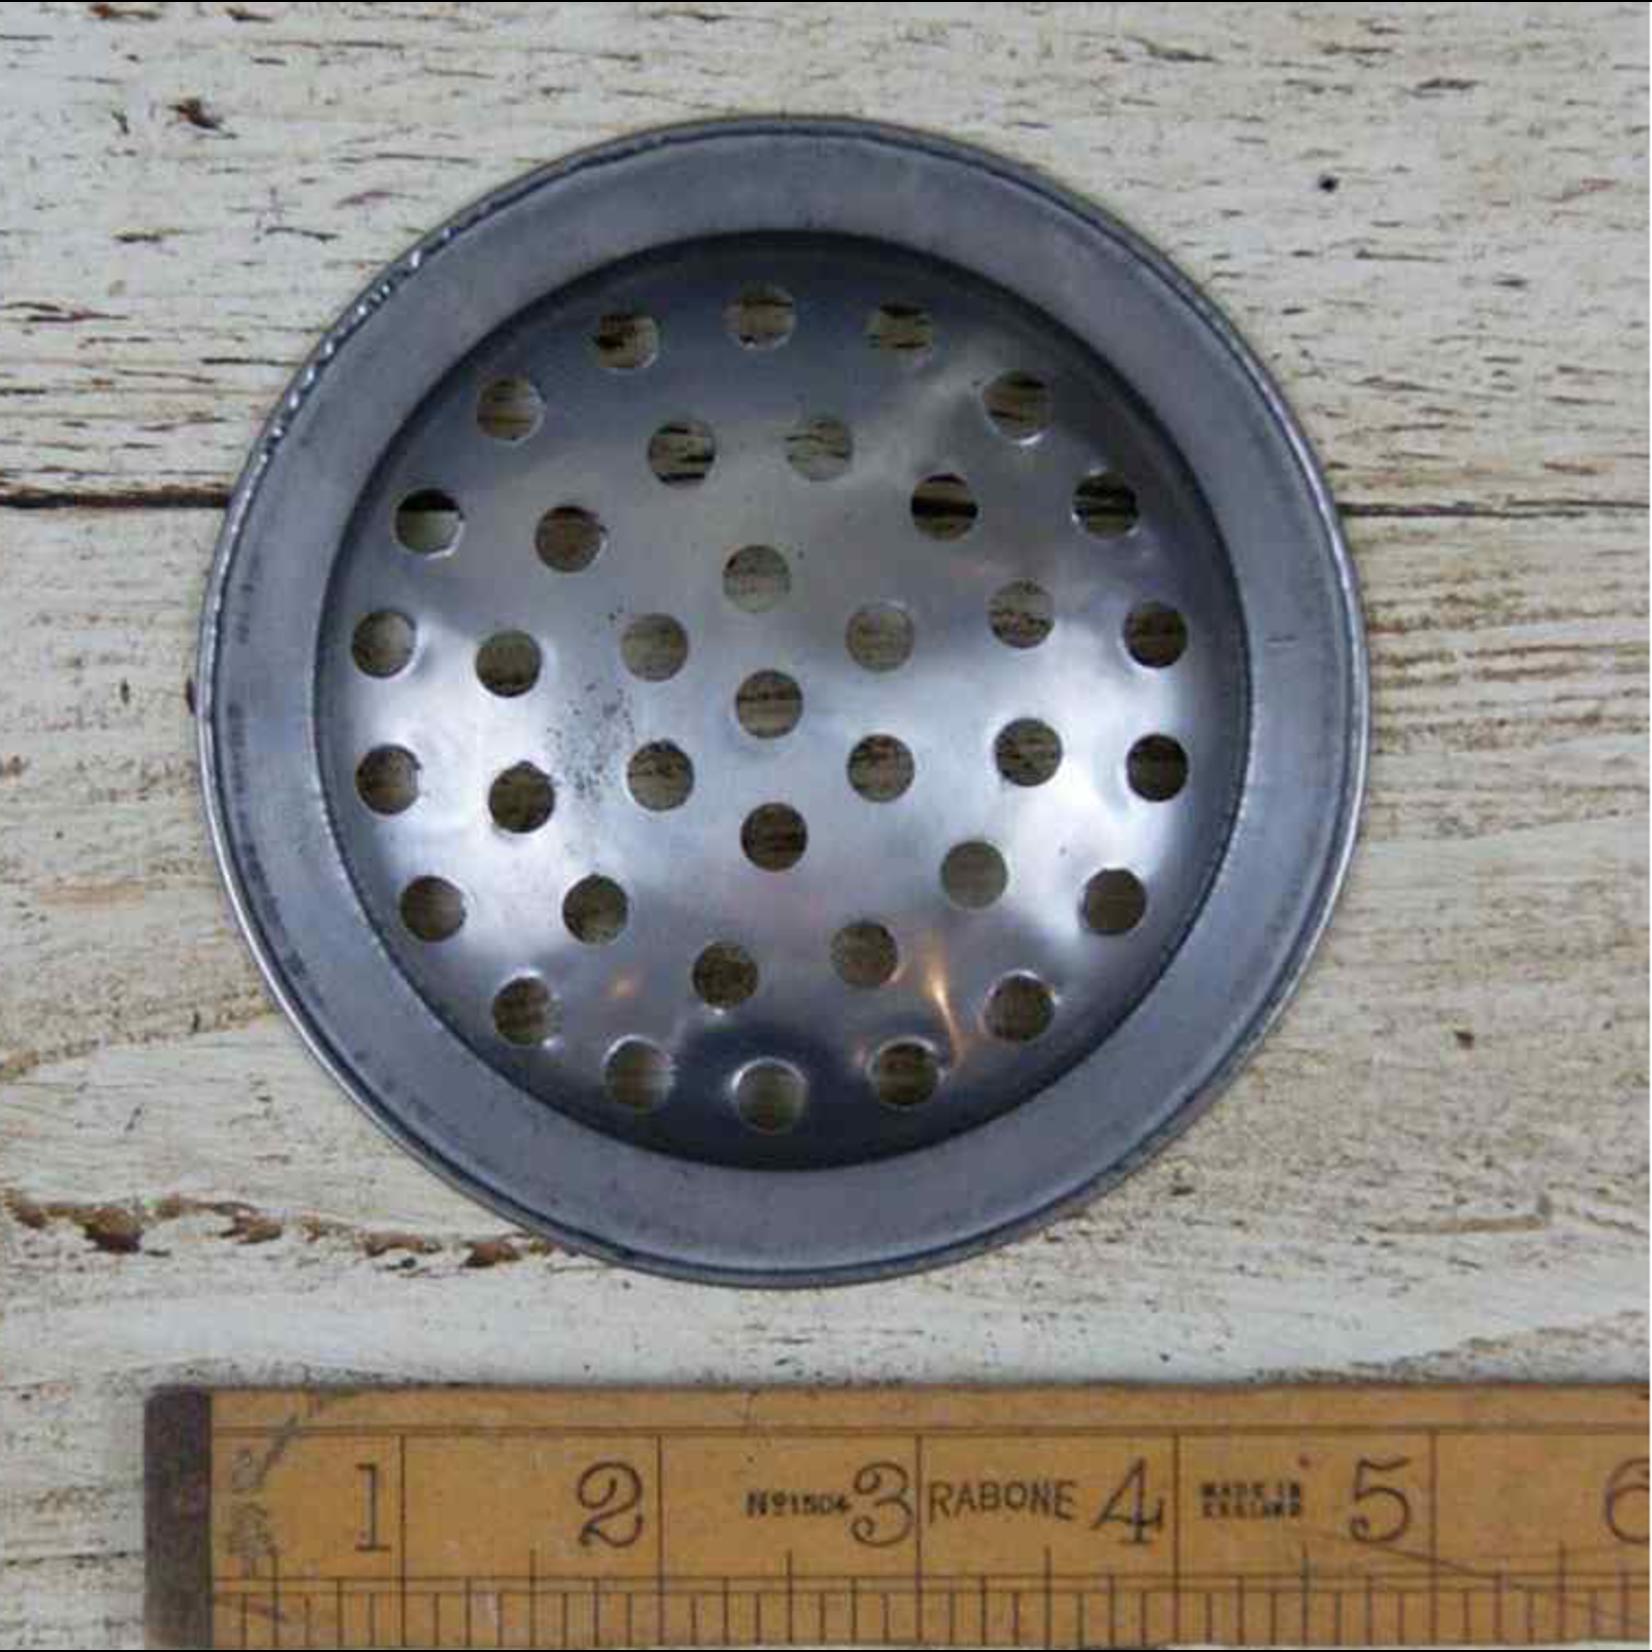 IRON RANGE Air vent Linen Cupboard Ventilation Disc Continental Antique